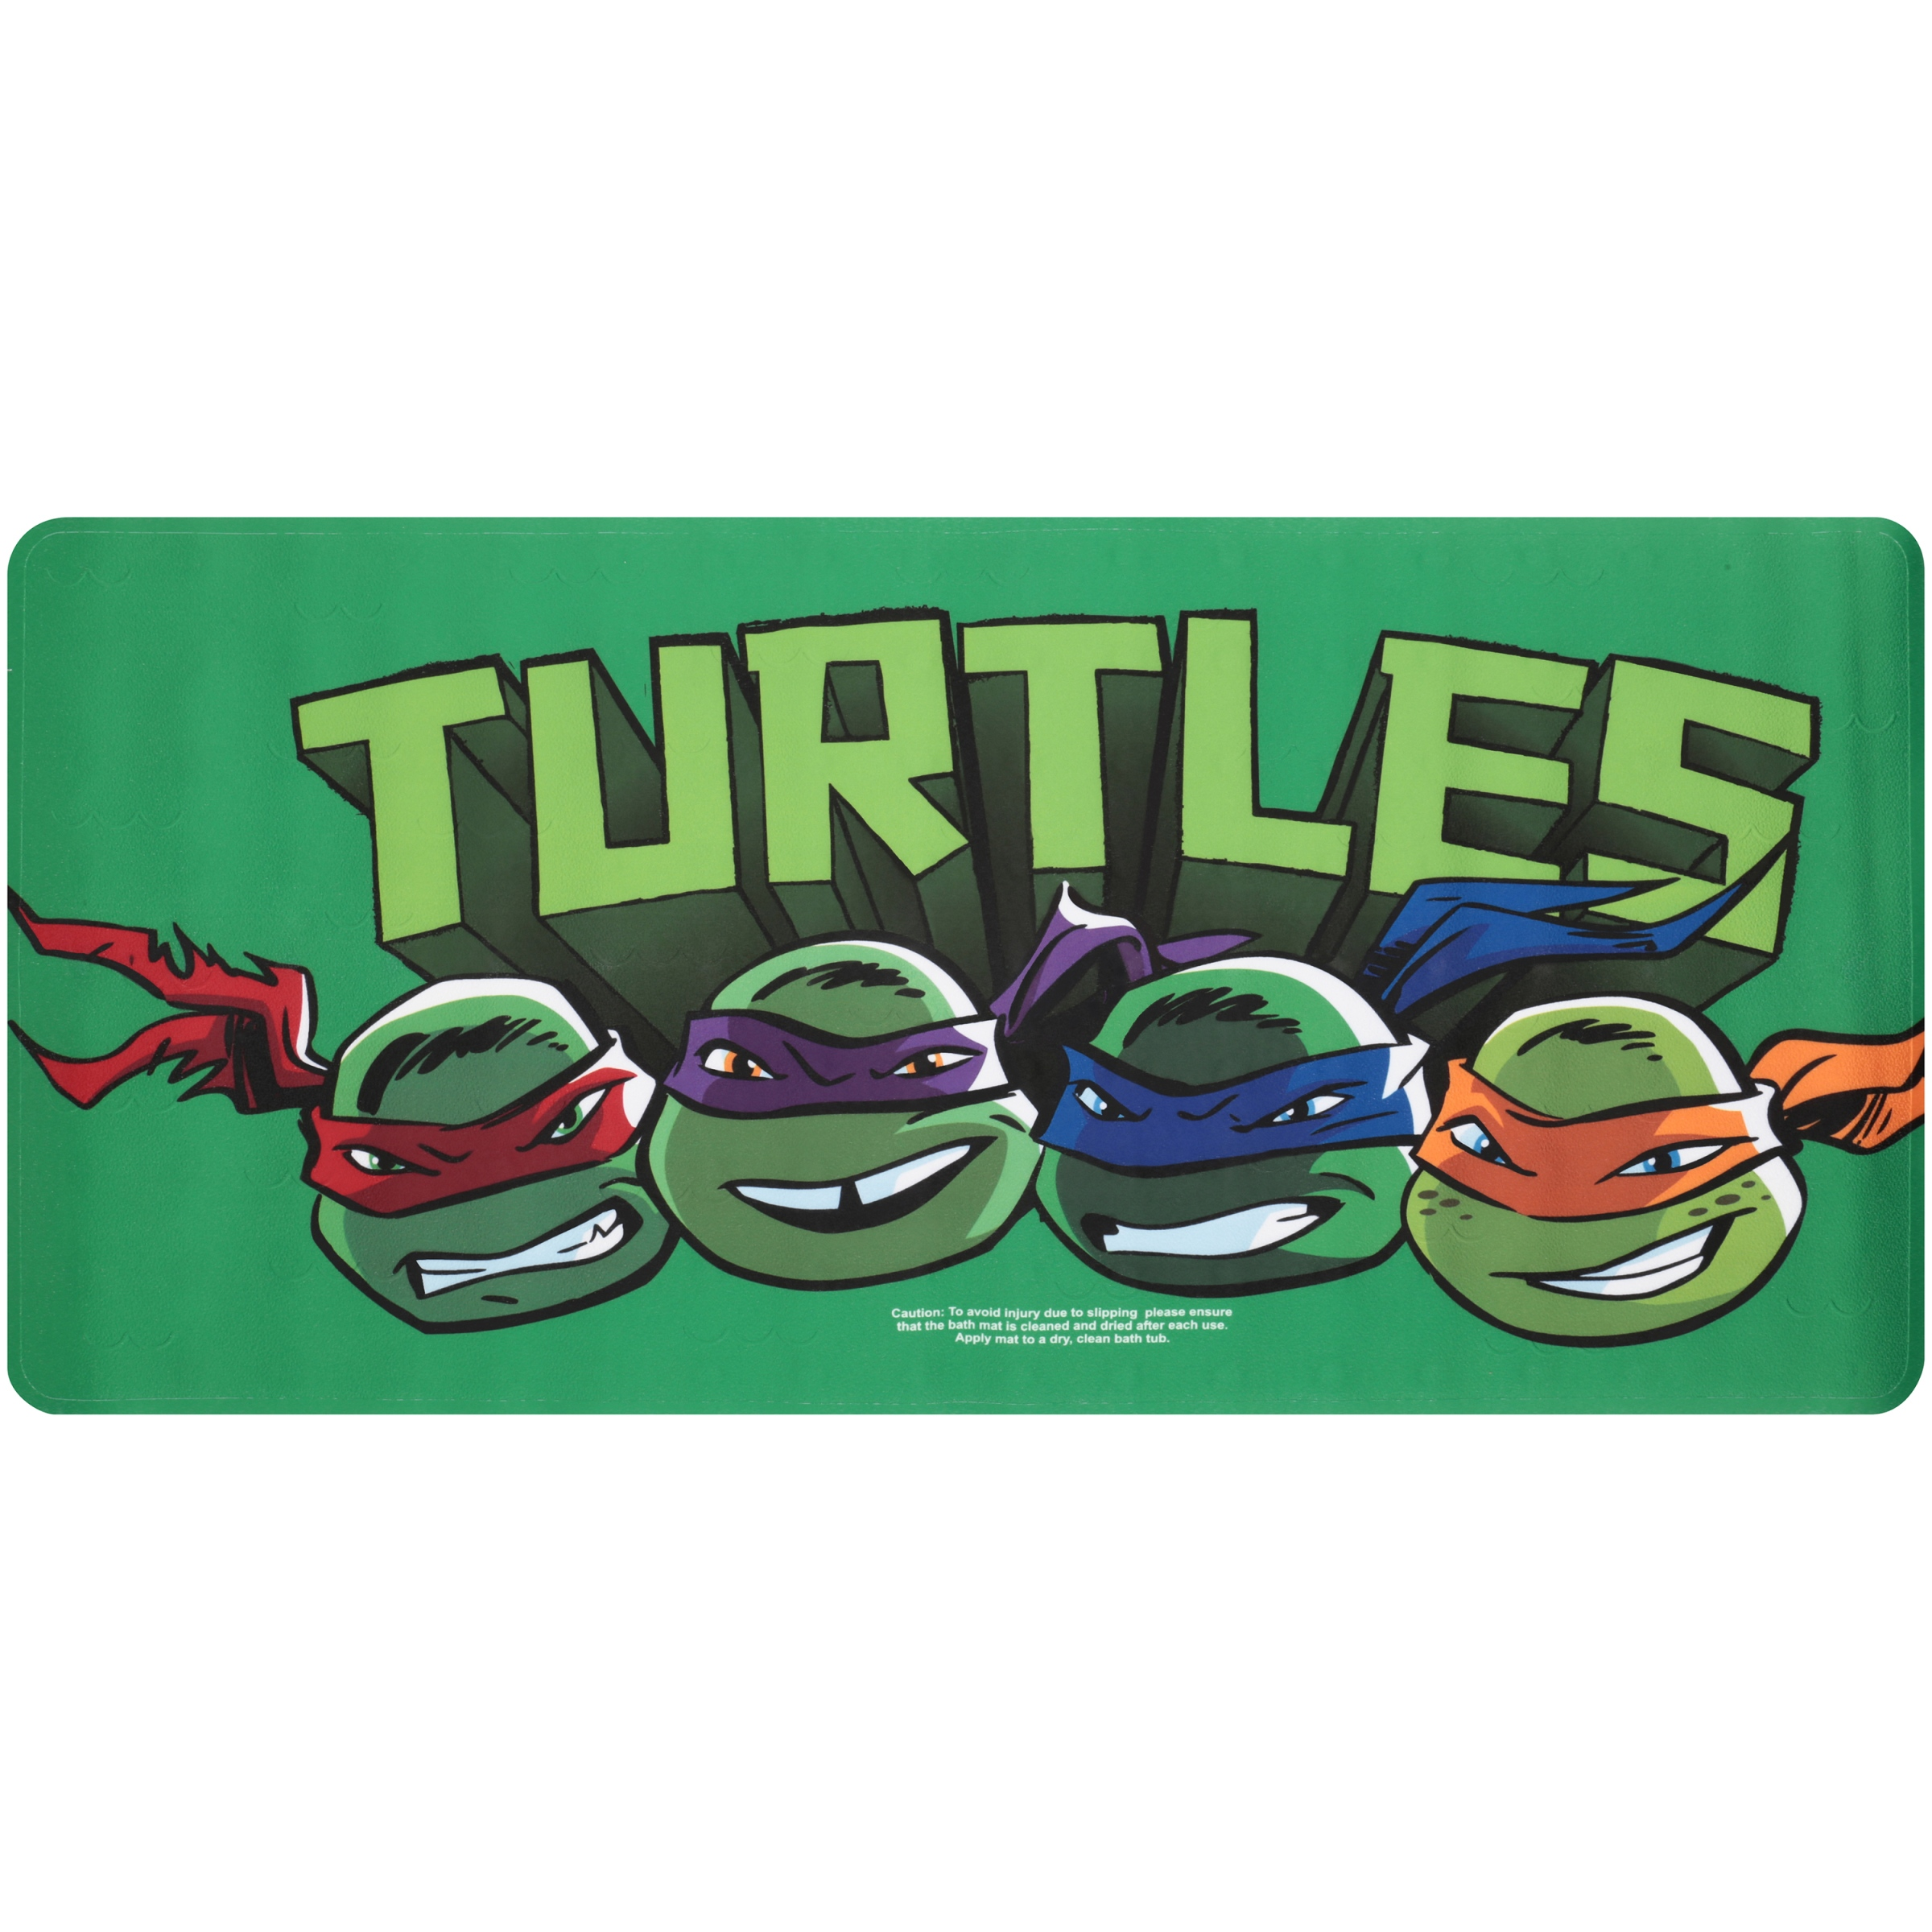 Nickelodeon Teenage Mutant Ninja Turtles Tub Mat Pack